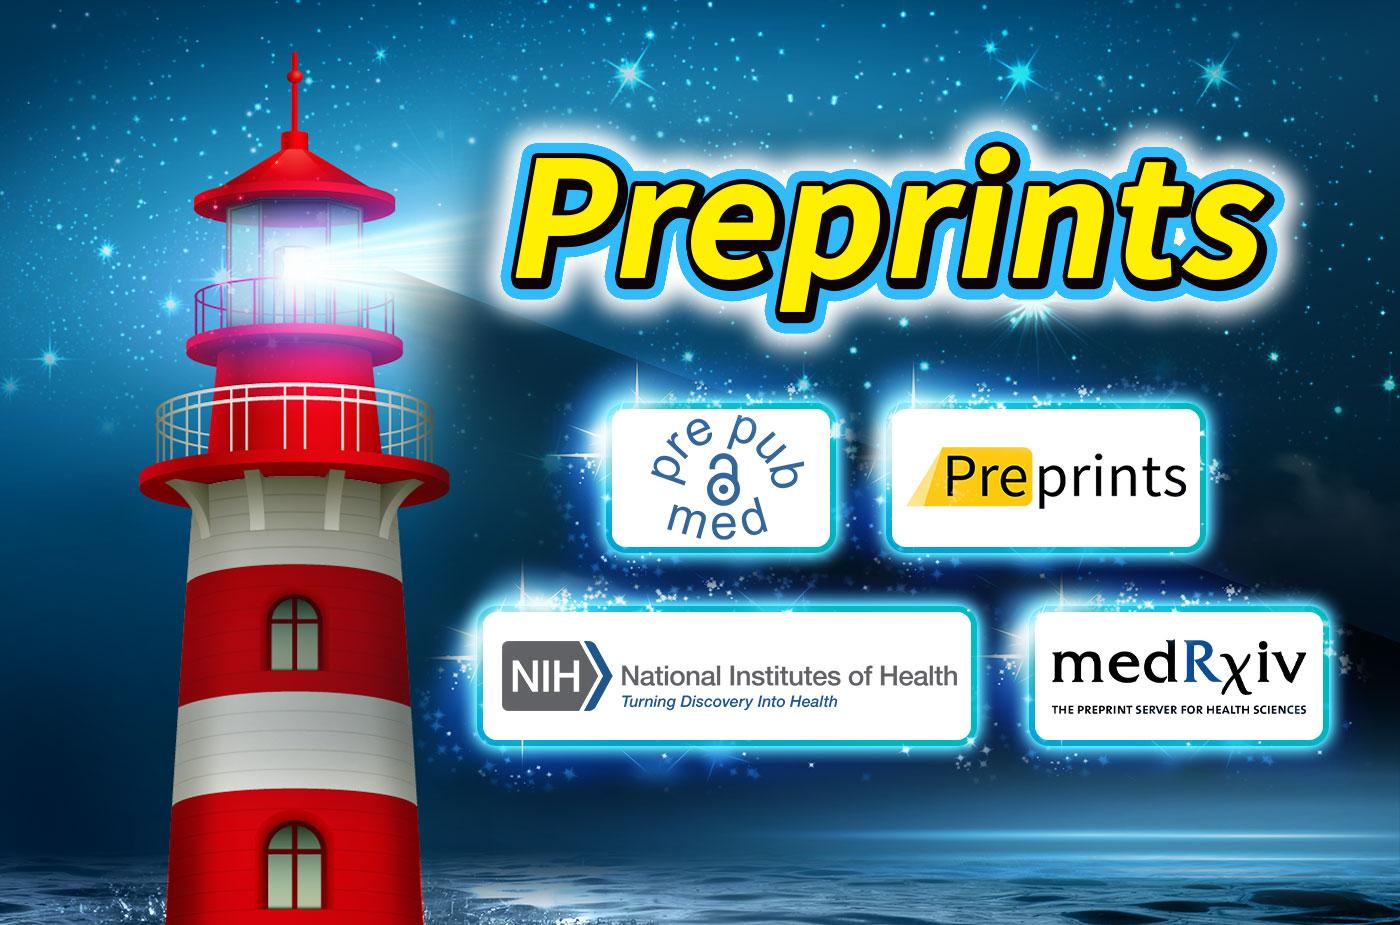 Preprints: Shining a light on emerging research